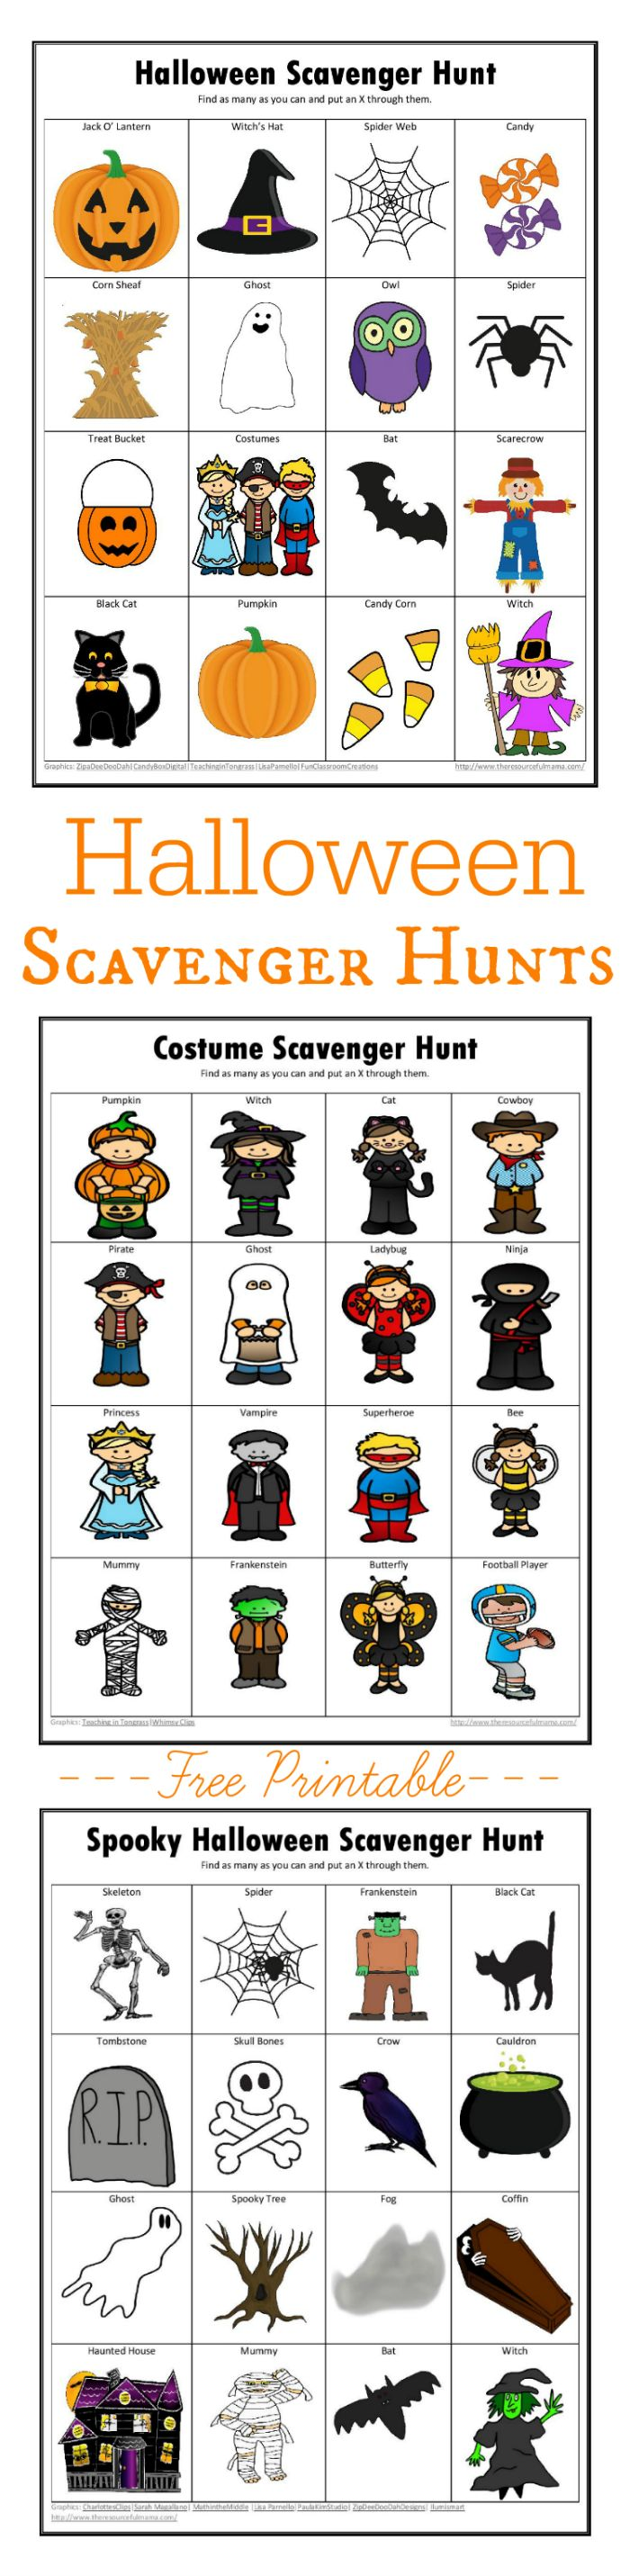 Free printable Halloween scavenger hunts. costume scavenger hunt | spooky Halloween scavenger hunt | not so spooky Halloween scavenger hunt